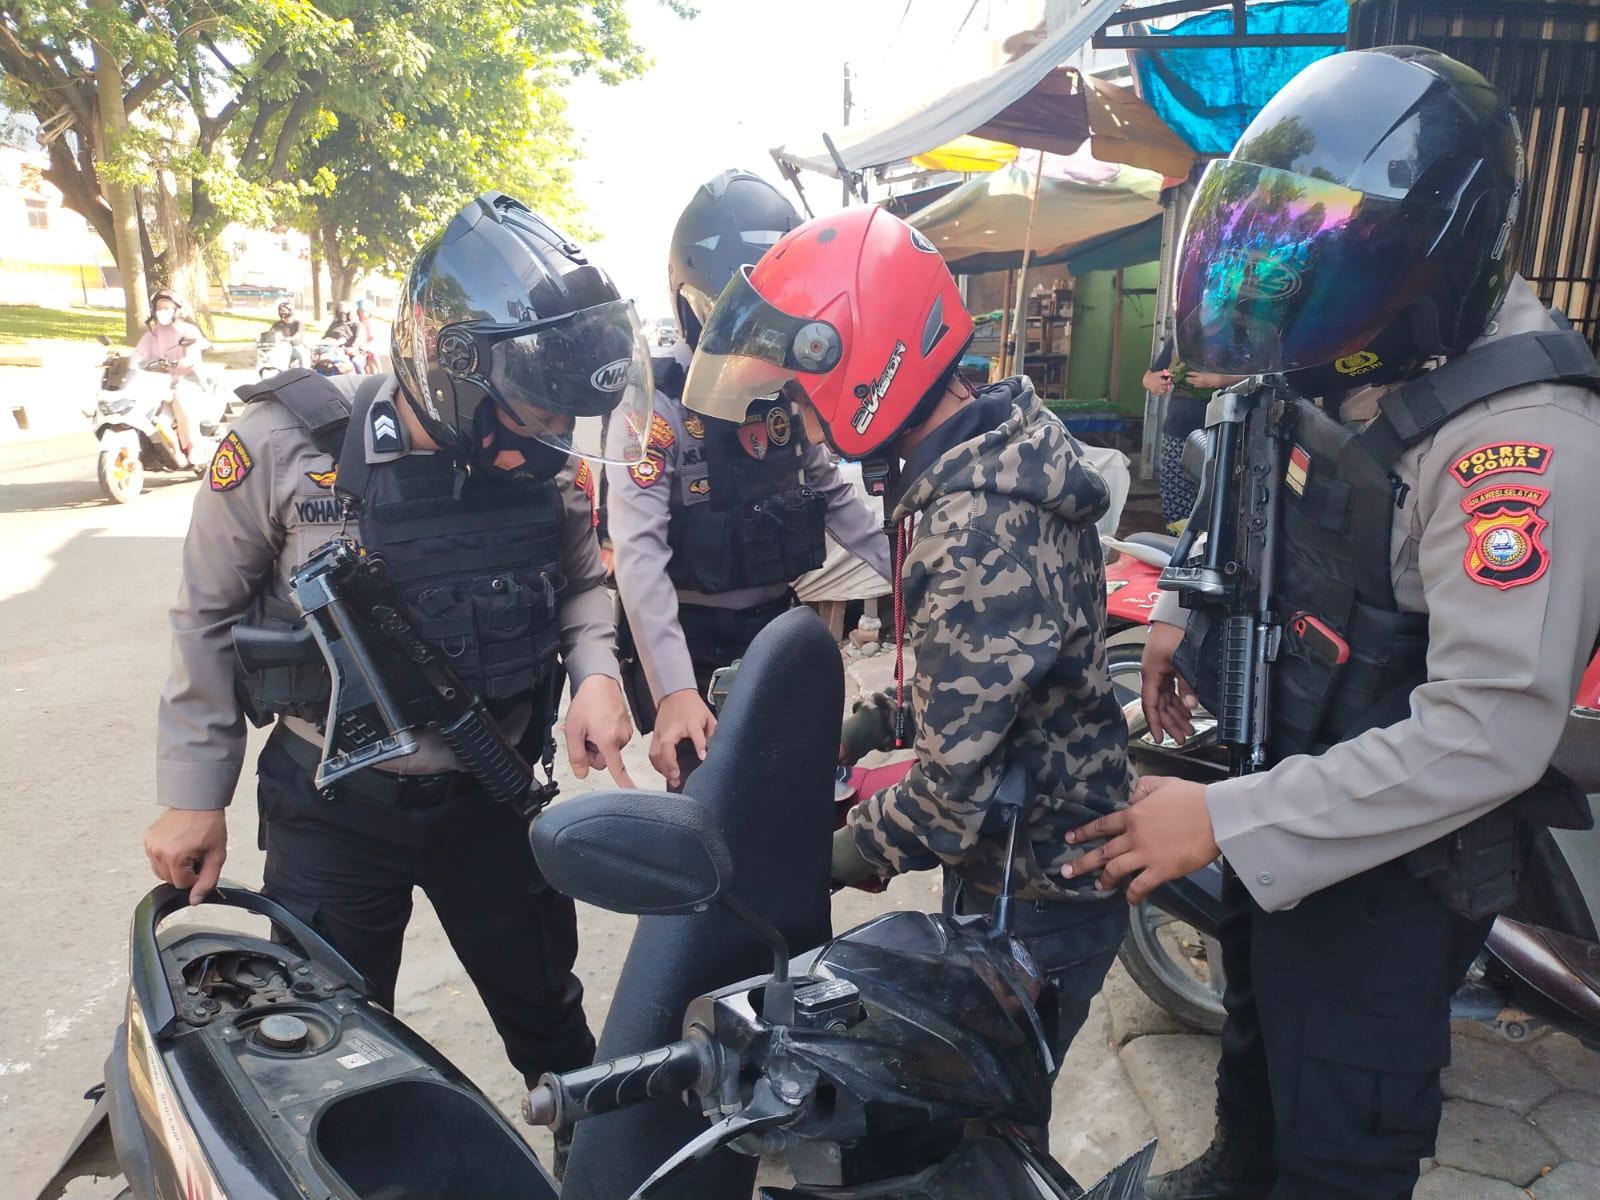 Tegakkan Displin Penggunaan Masker, Unit 01 Turjawali Samapta Polres Gowa Gelar Operasi Yustisi